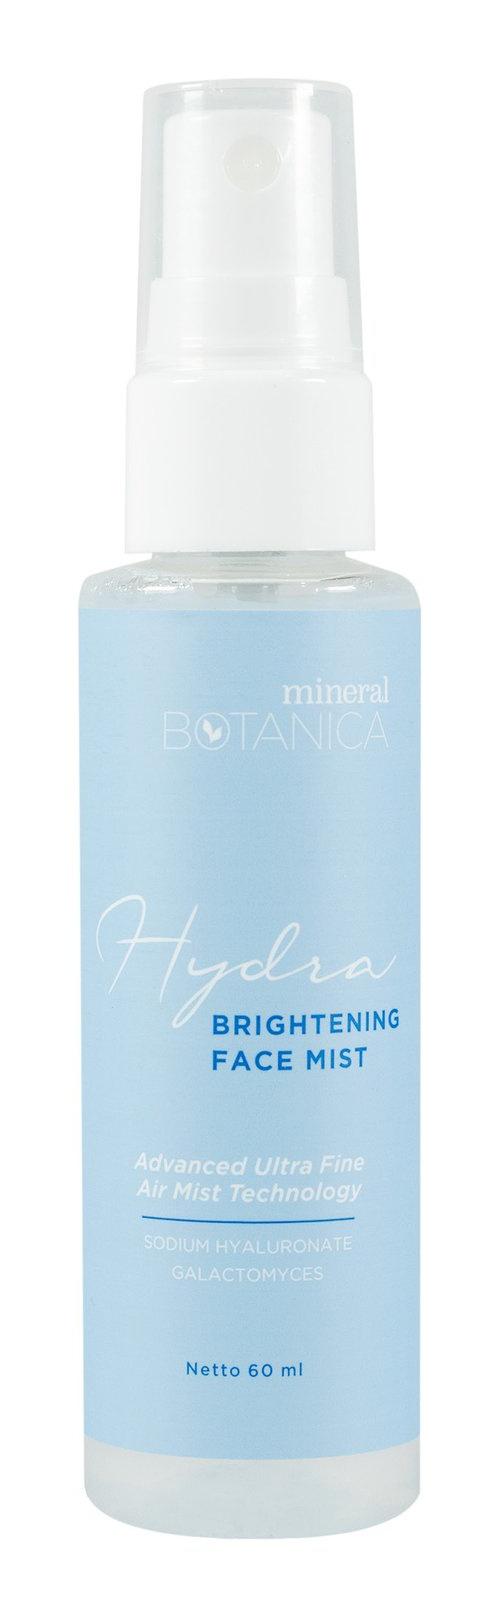 Mineral botanica Hydra Face Mist - Brightening